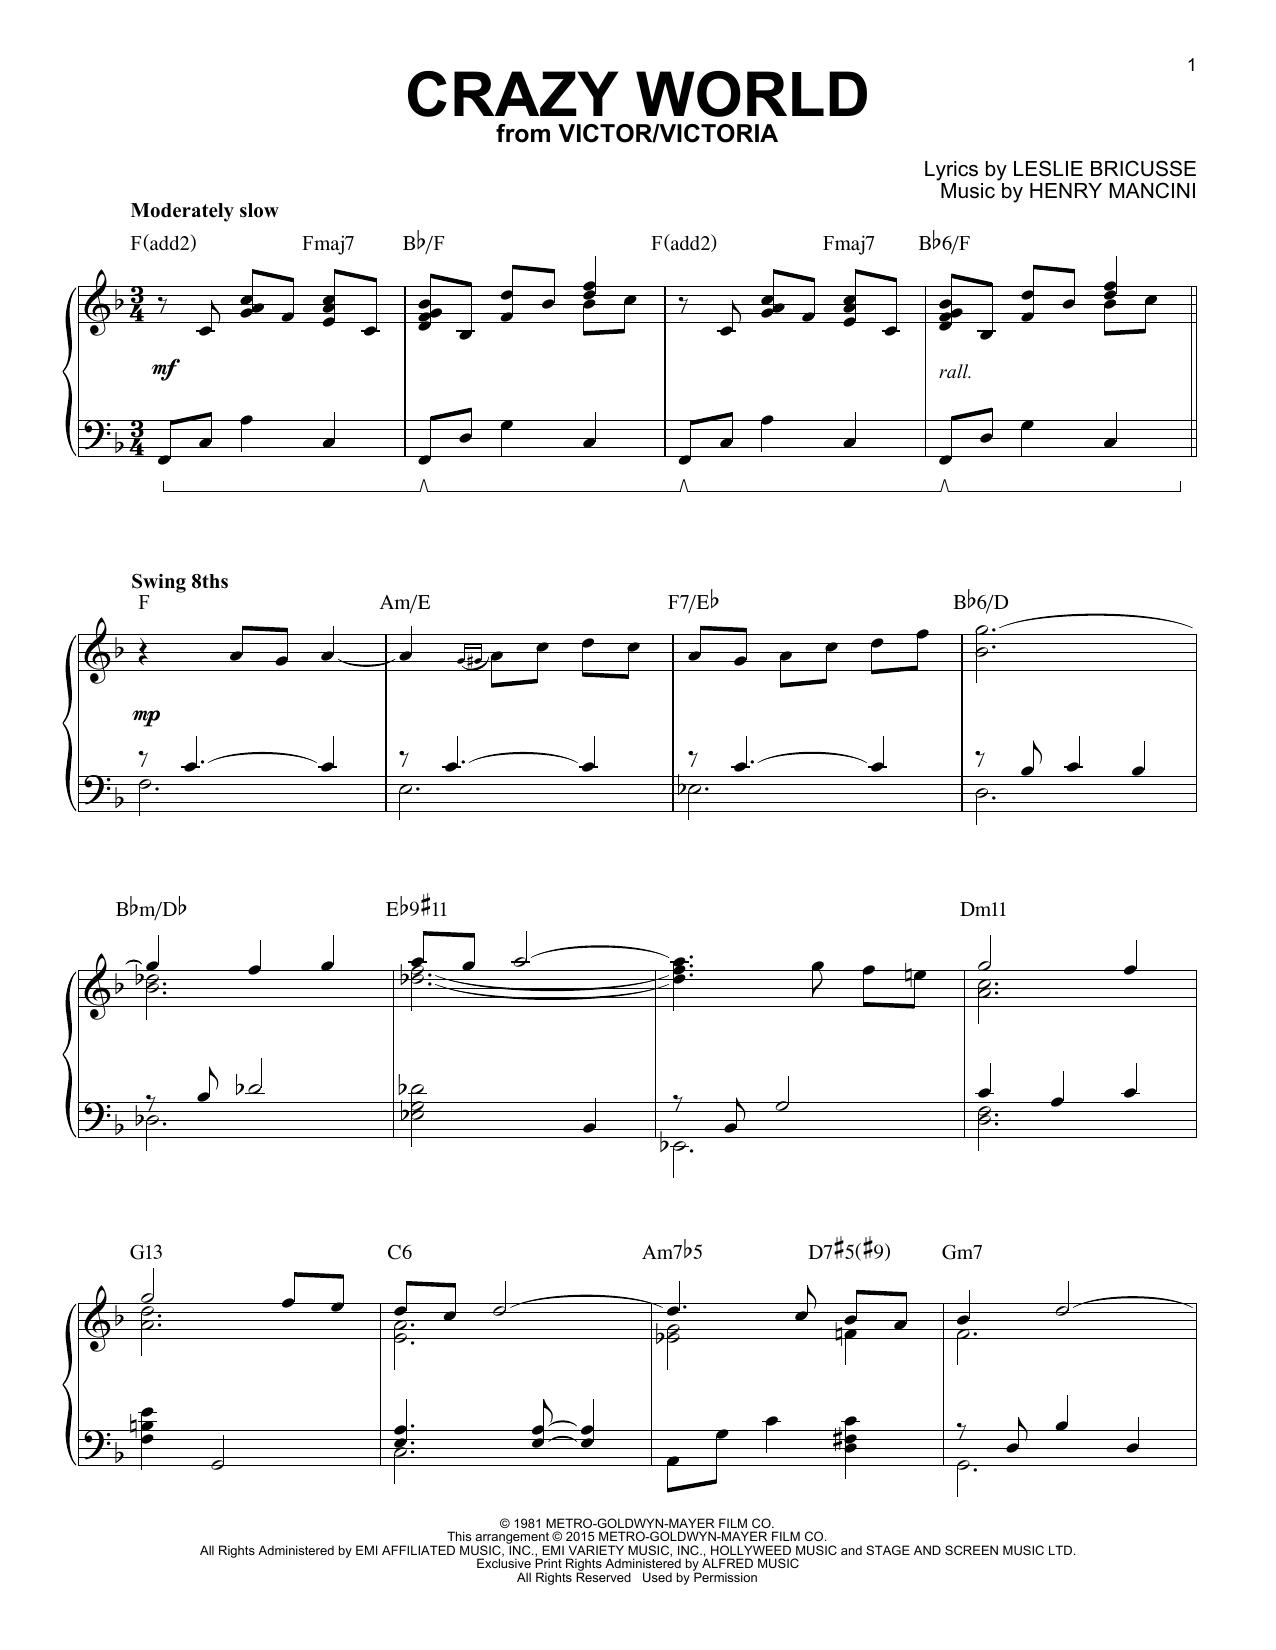 Henry Mancini Crazy World [Jazz version] (arr. Brent Edstrom) sheet music notes and chords. Download Printable PDF.